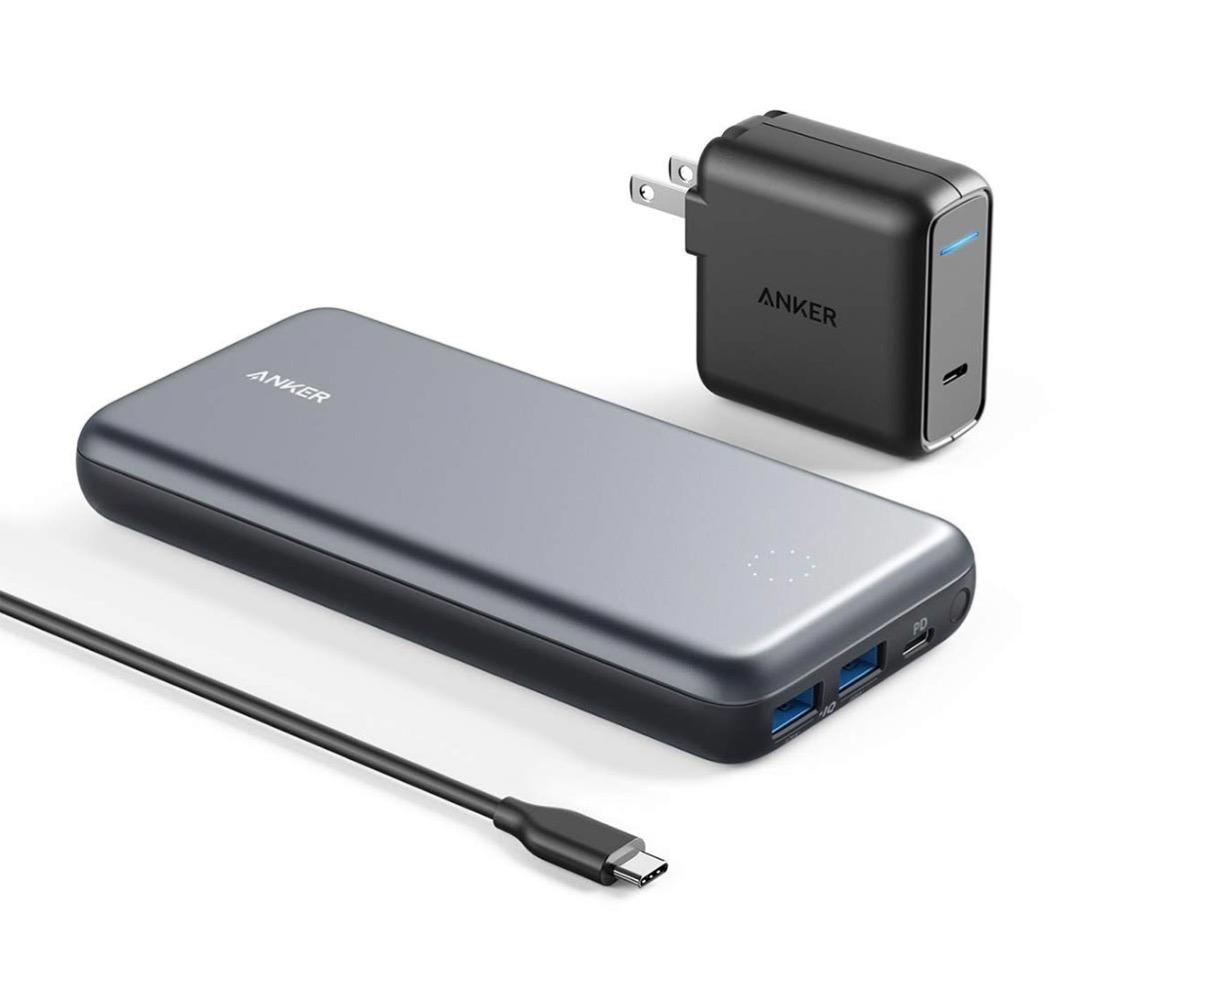 Anker、最大27W出力のUSB PD対応とUSBハブモード搭載したモバイルバッテリー「Anker PowerCore+ 19000 PD」の販売を開始